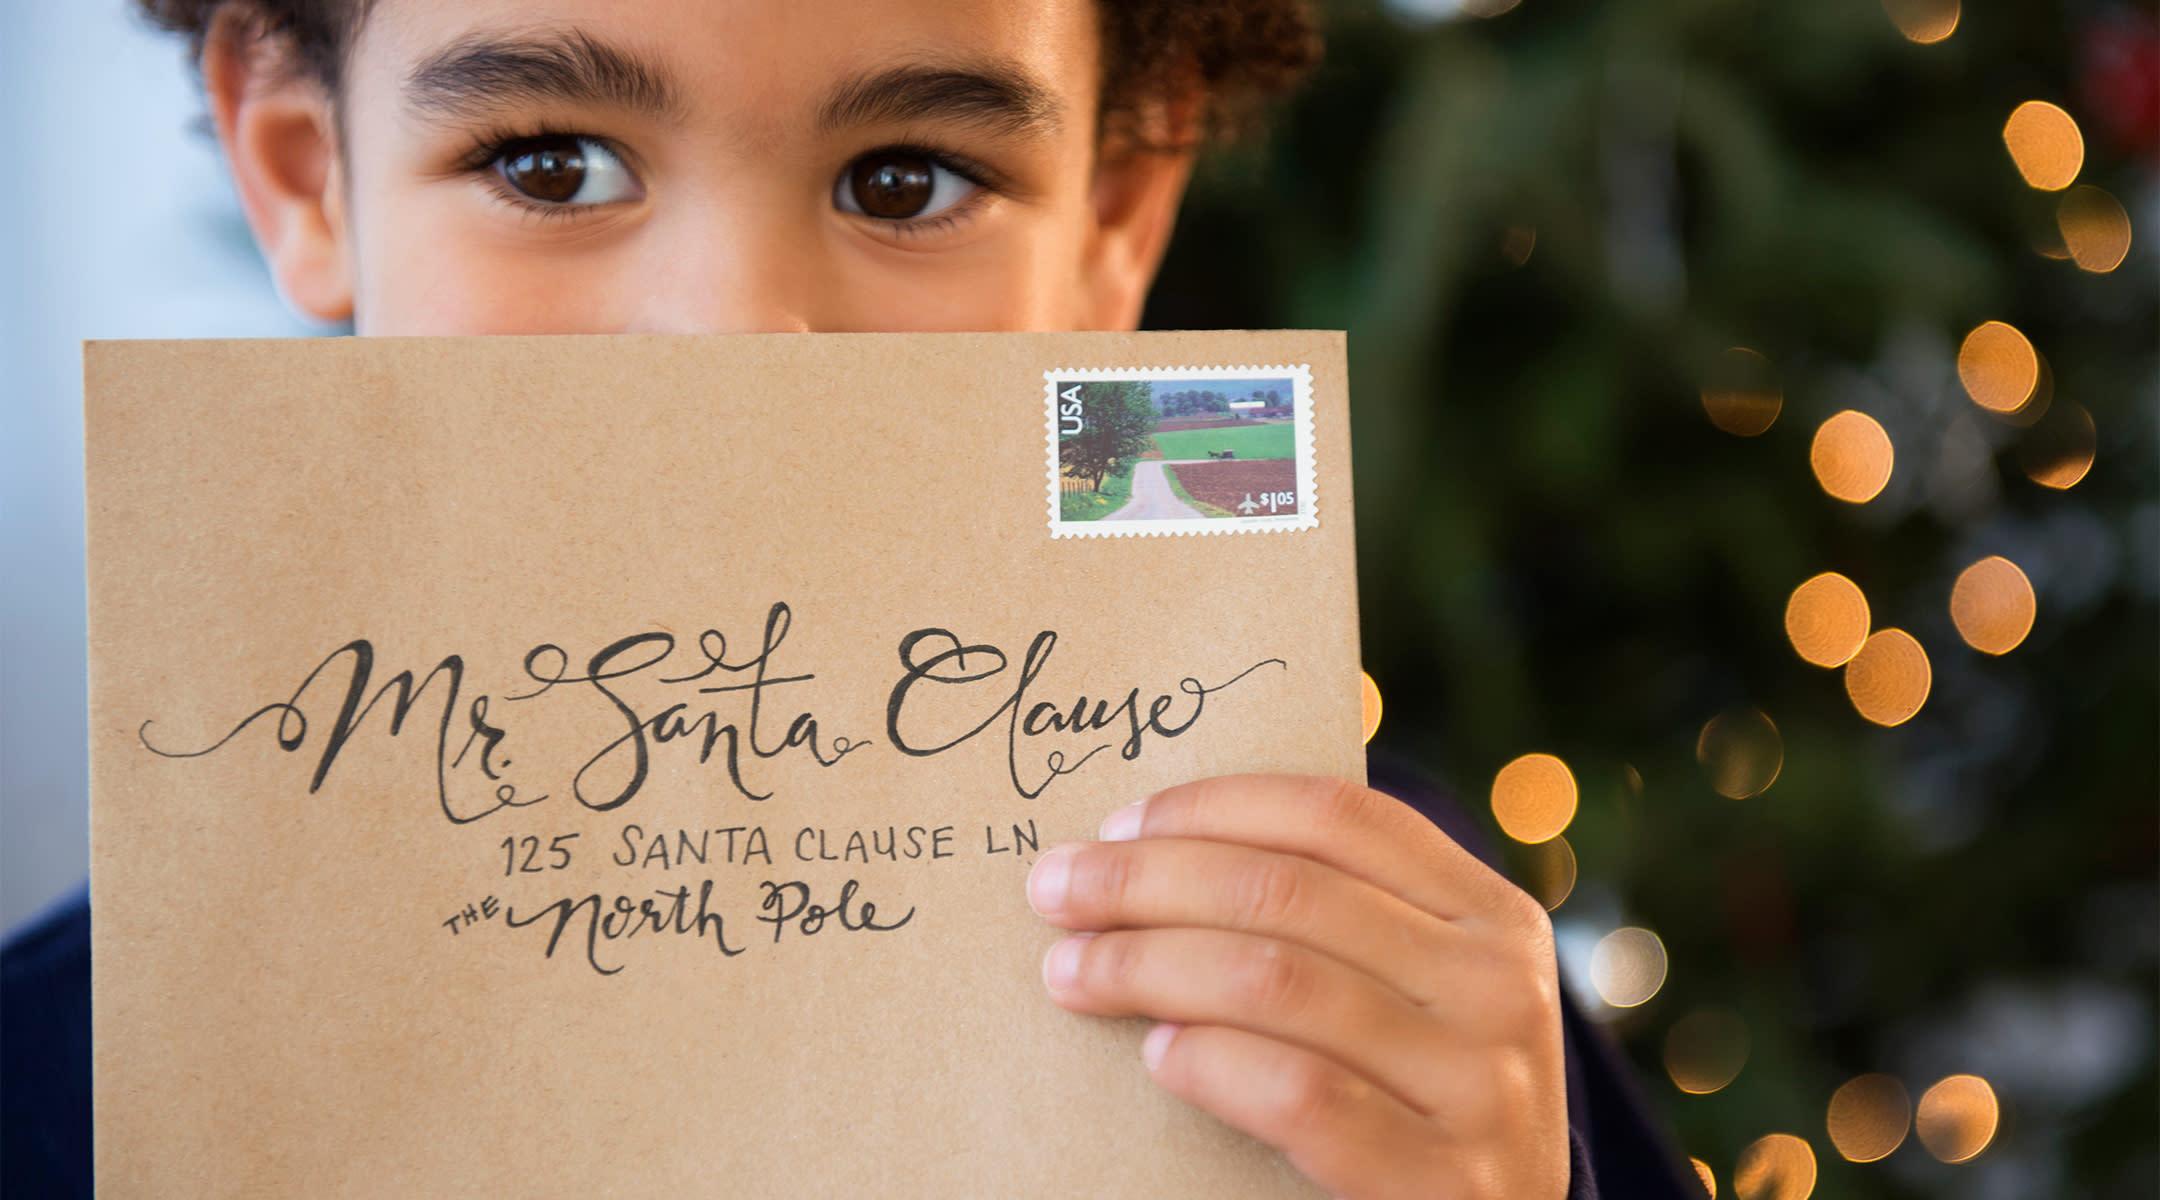 toddler holds envelope addressed to santa